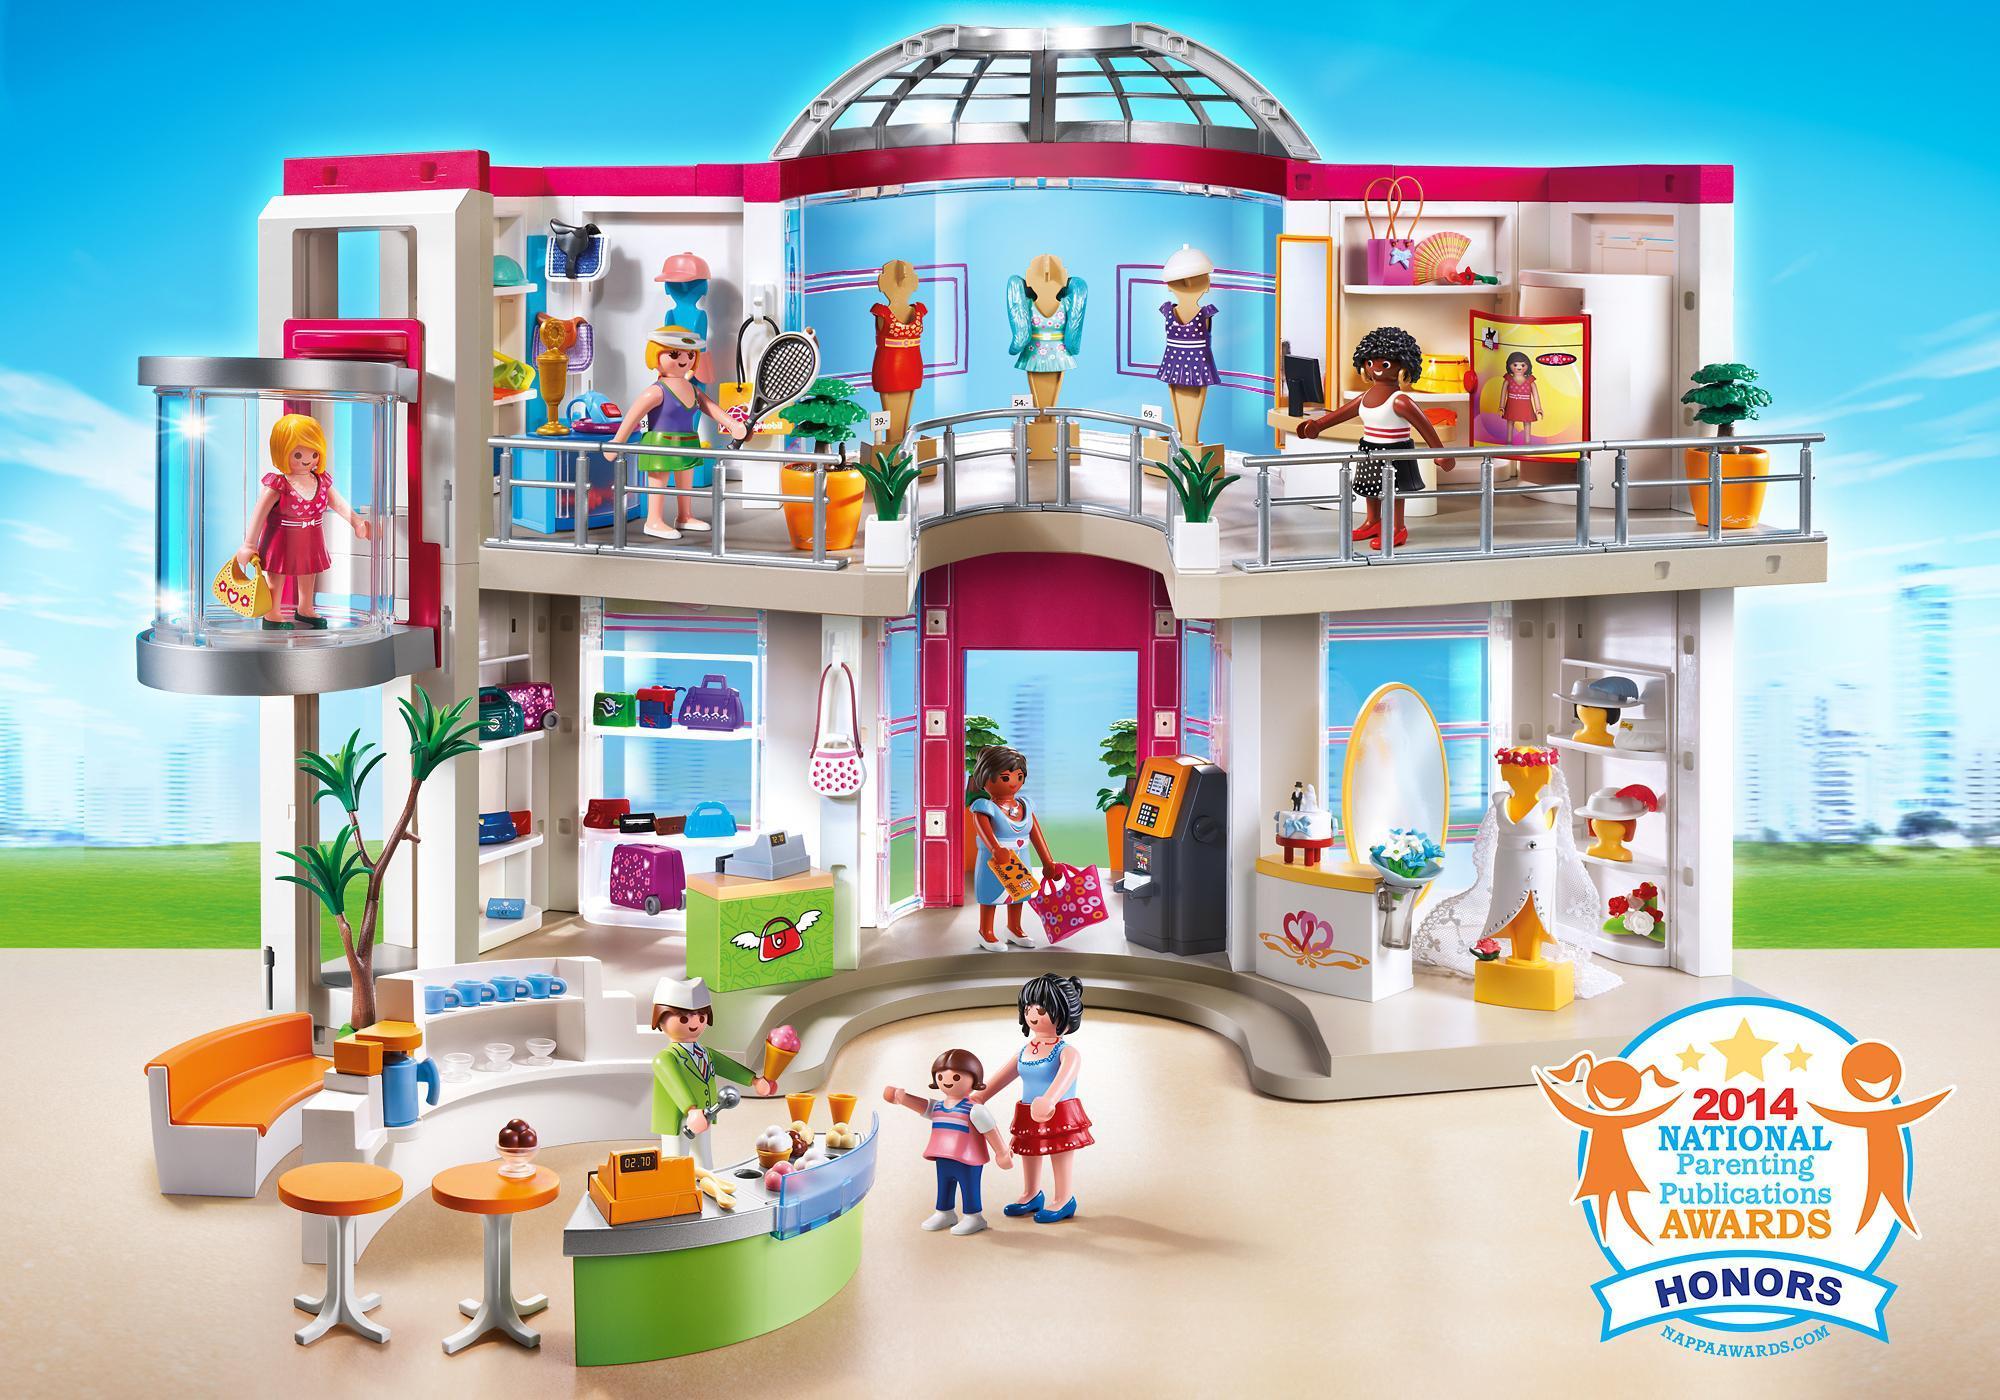 http://media.playmobil.com/i/playmobil/5485_product_detail/Compleet ingericht Winkelcentrum